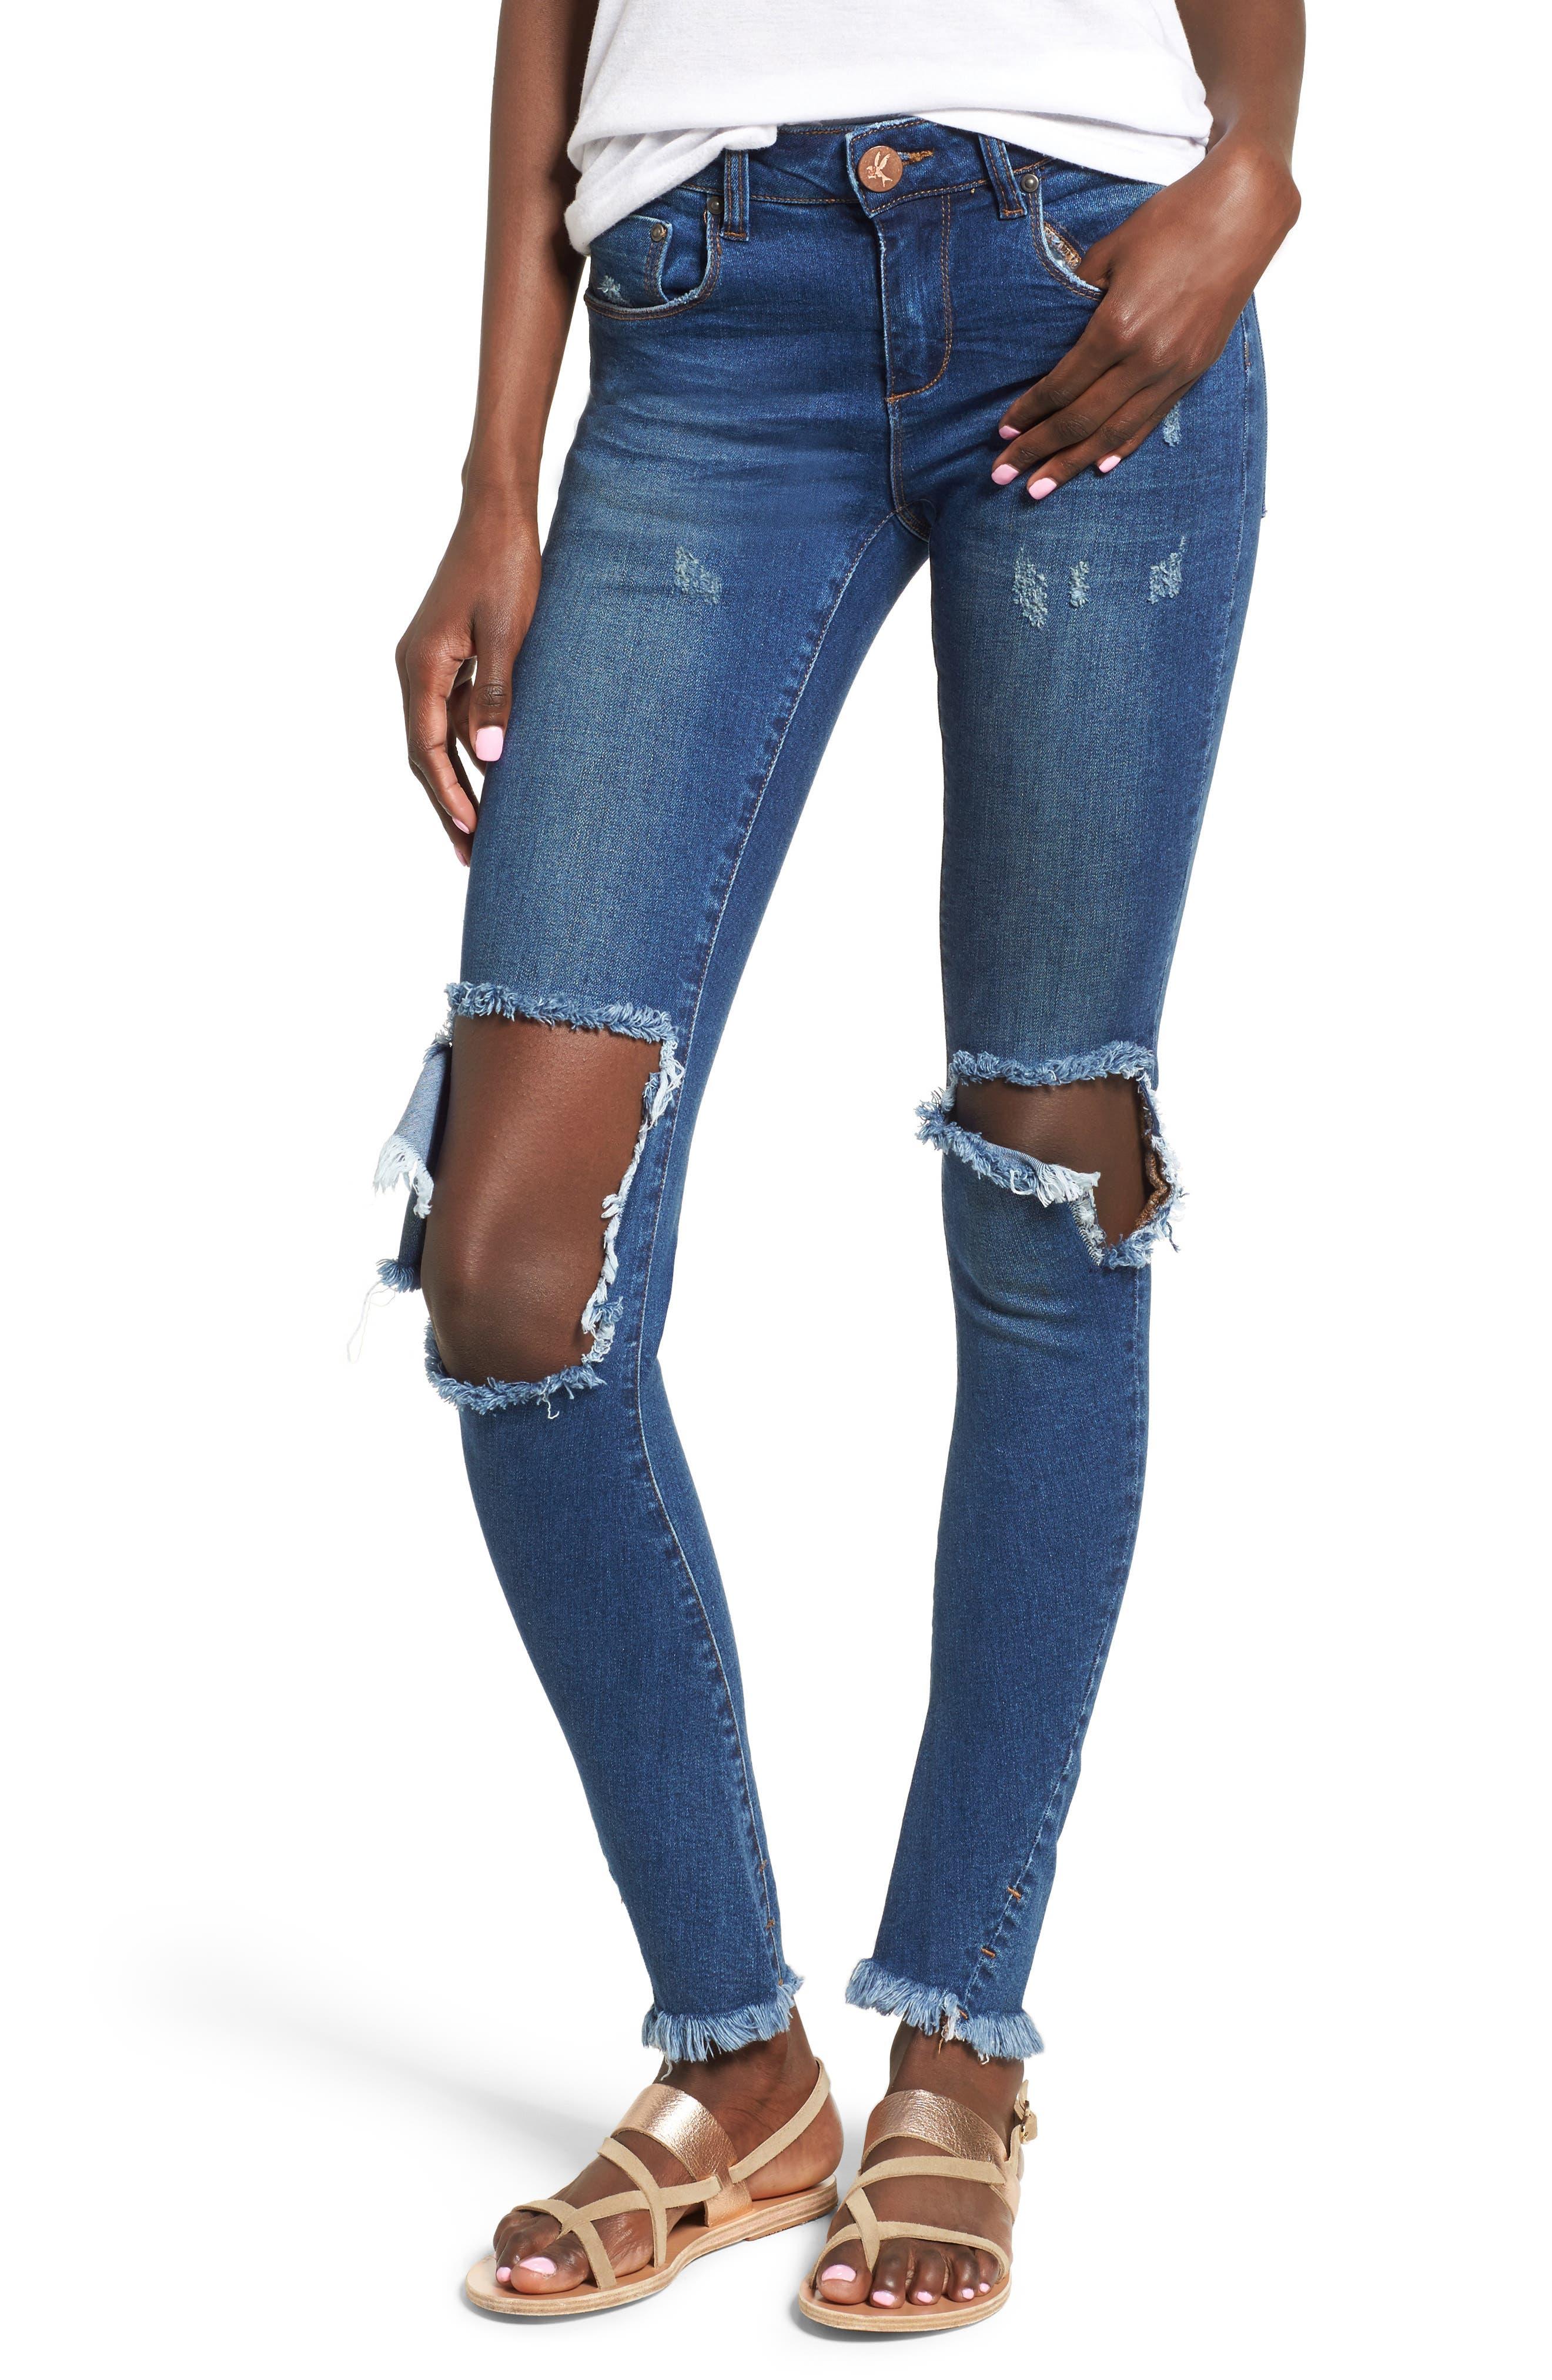 One Teaspoon Ripped Skinny Jeans (Bonnie Blue)